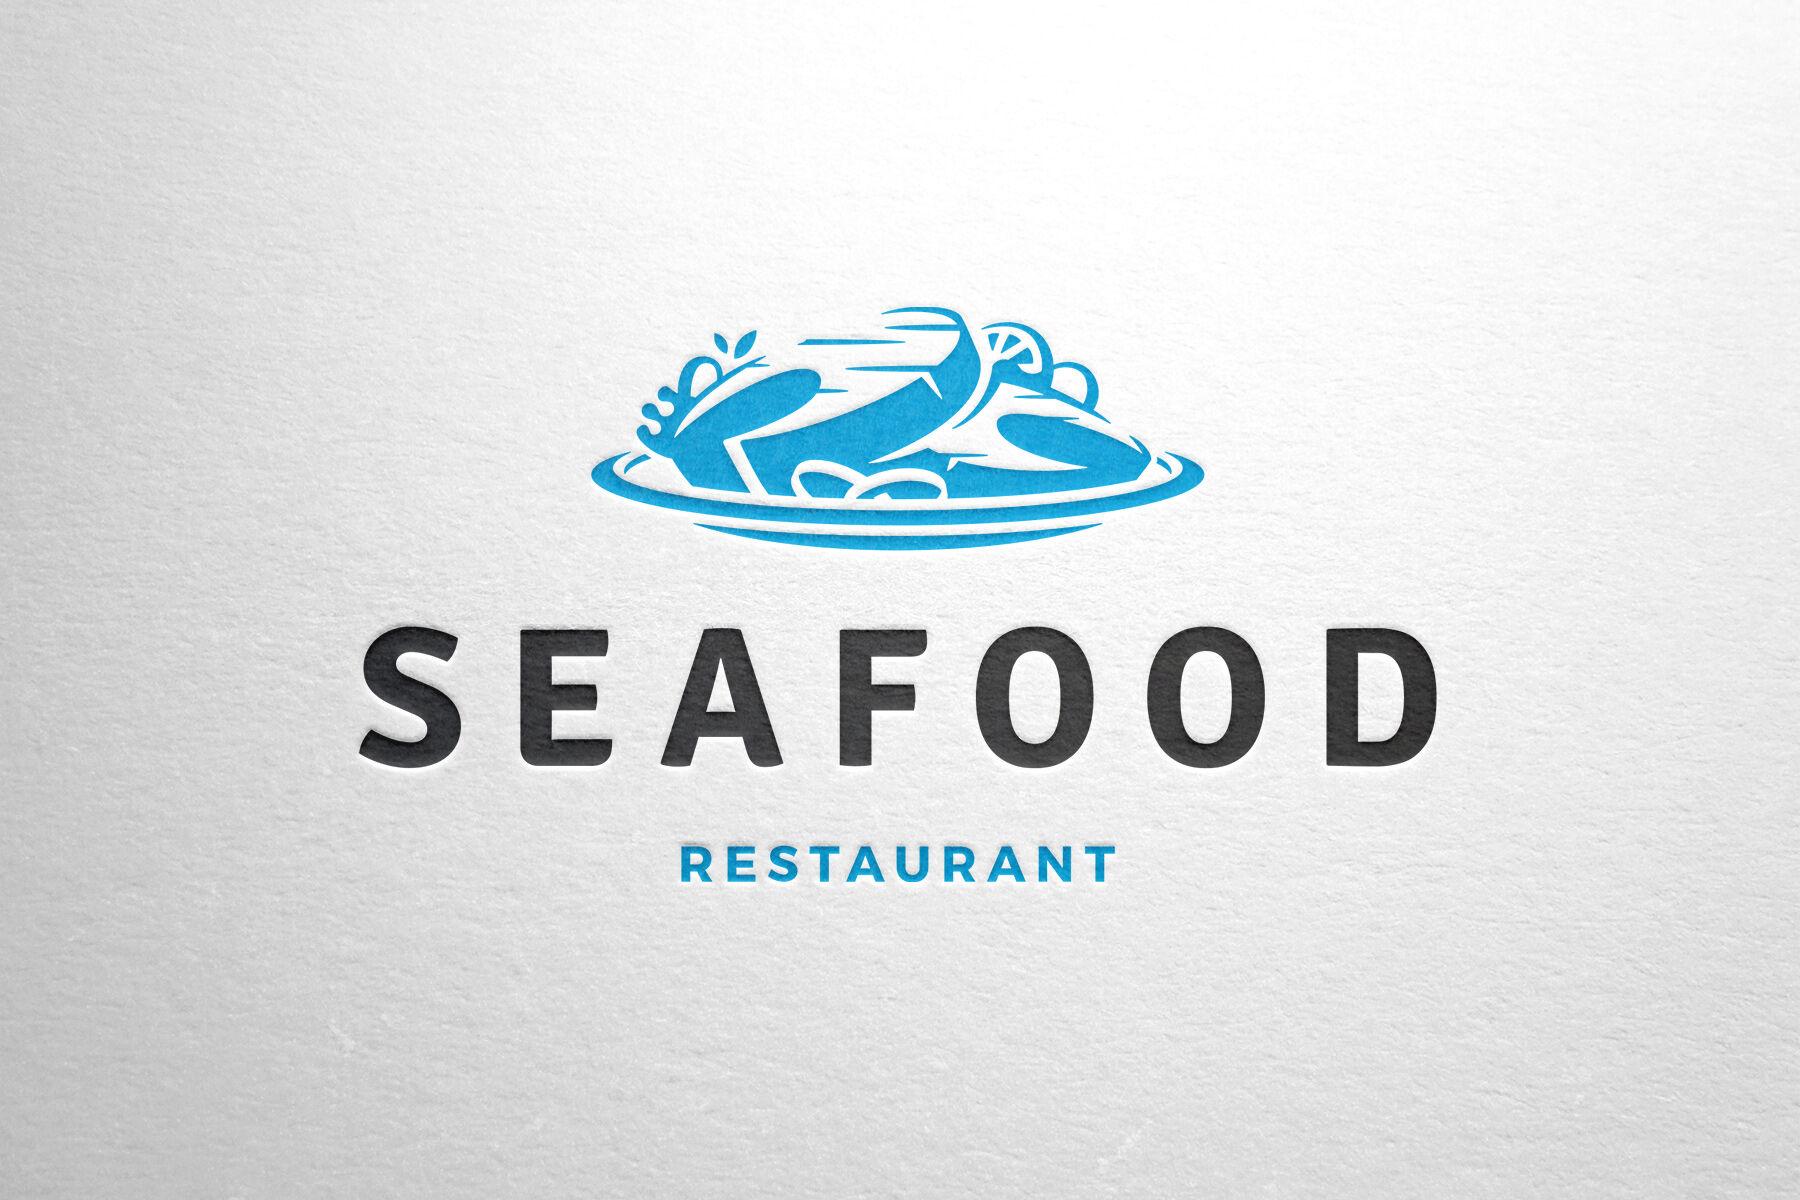 Seafood Restaurant Logo Design By Vasya Kobelev Thehungryjpeg Com